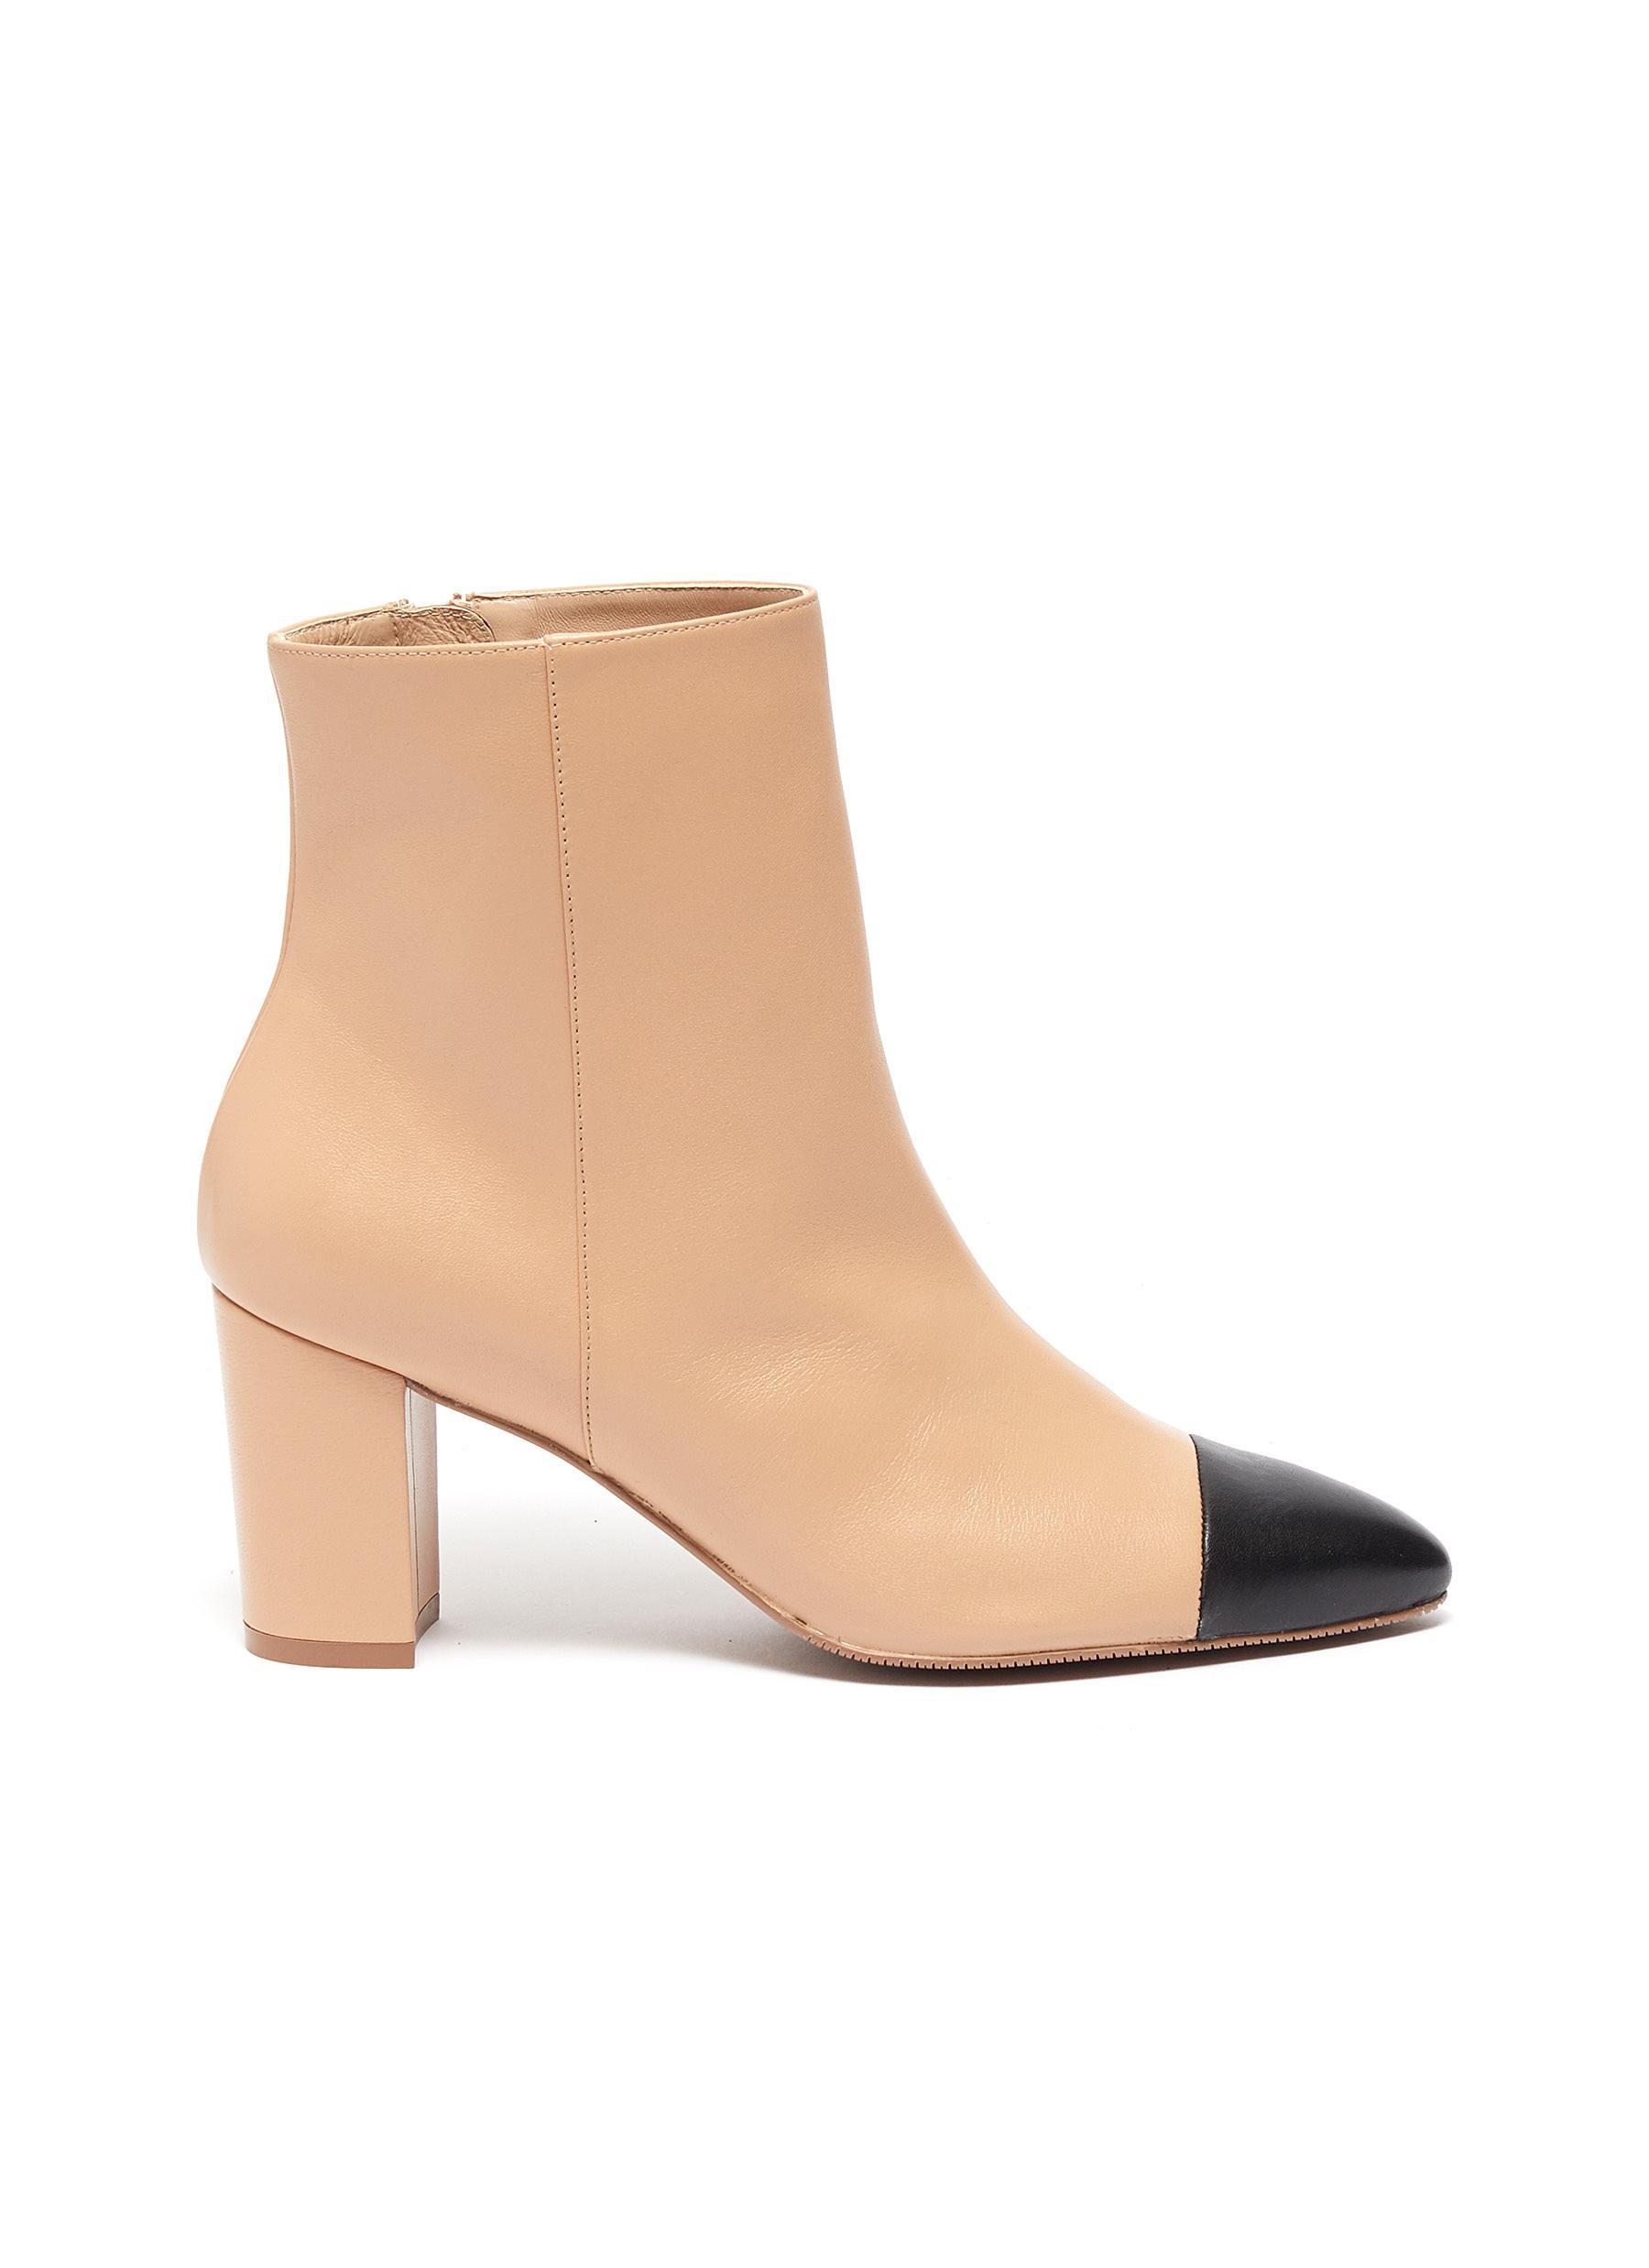 Jill contrast toe leather ankle boots by Stuart Weitzman